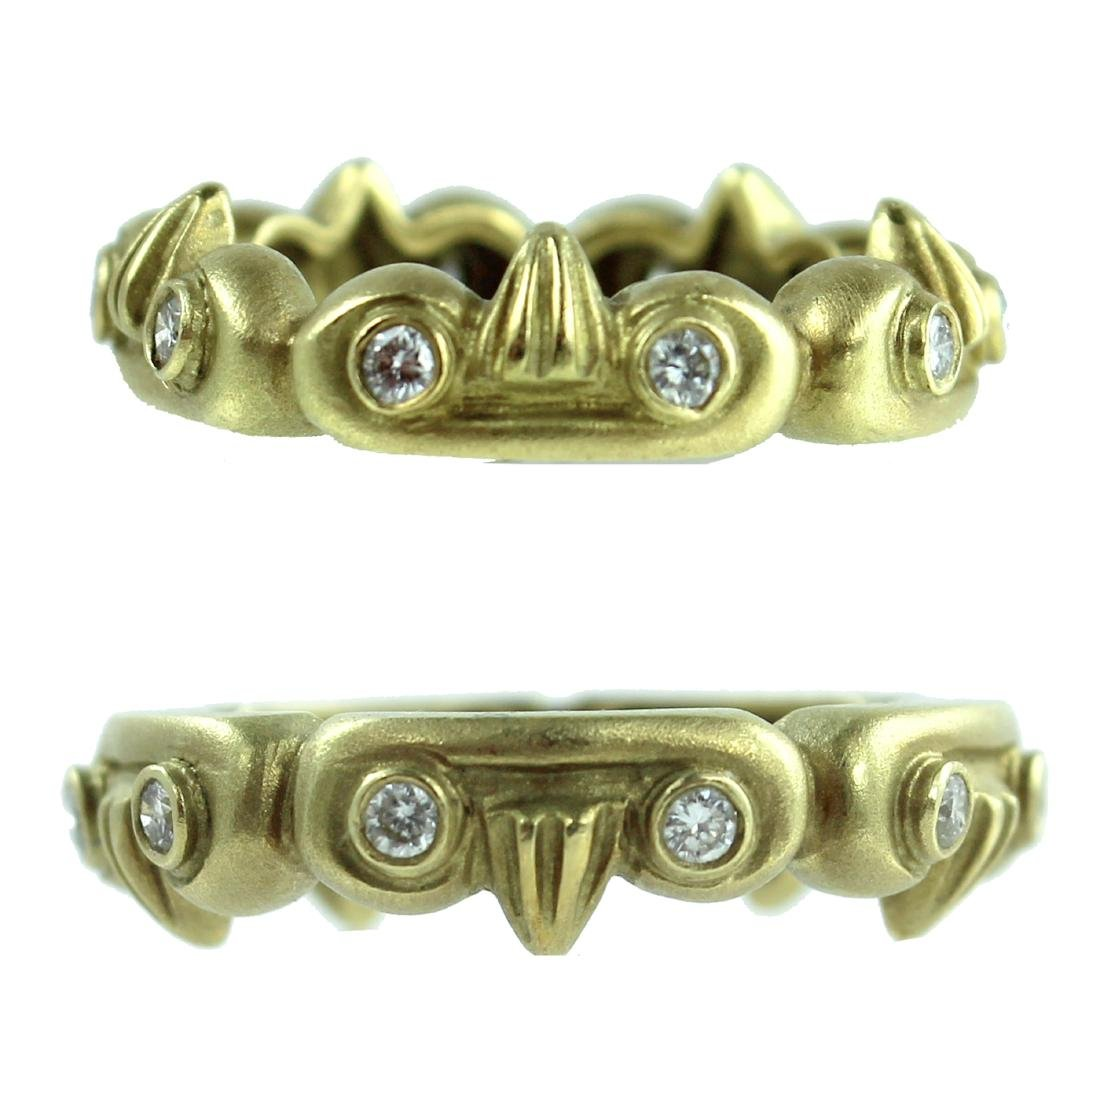 2)TWO 18K YELLOW GOLD & DIAMOND DESIGNER RINGS